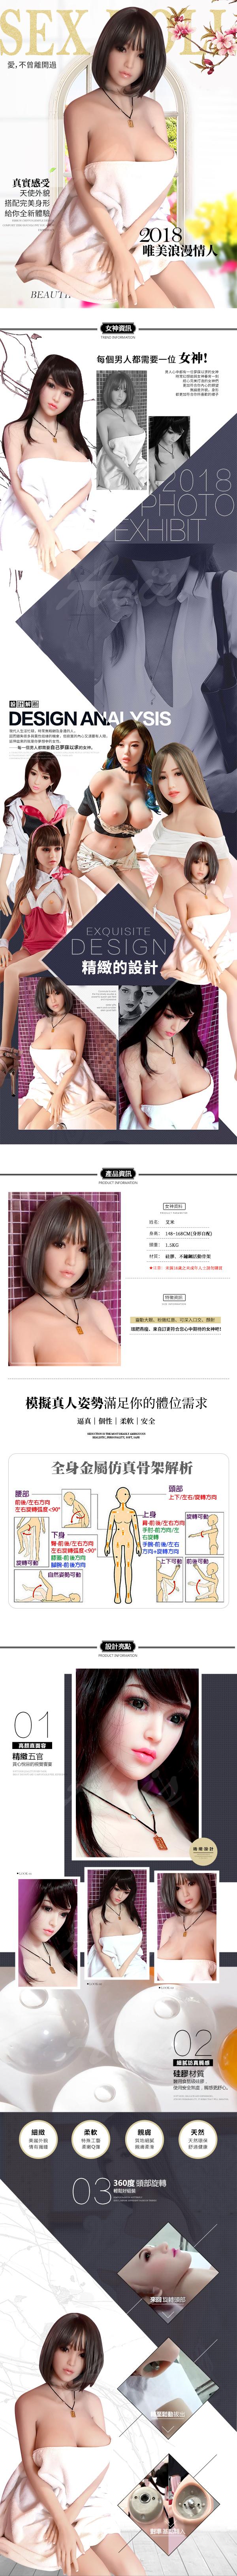 AMY艾咪 真人版矽膠娃娃頭 鄰家女孩 可安裝148~168cm 身體